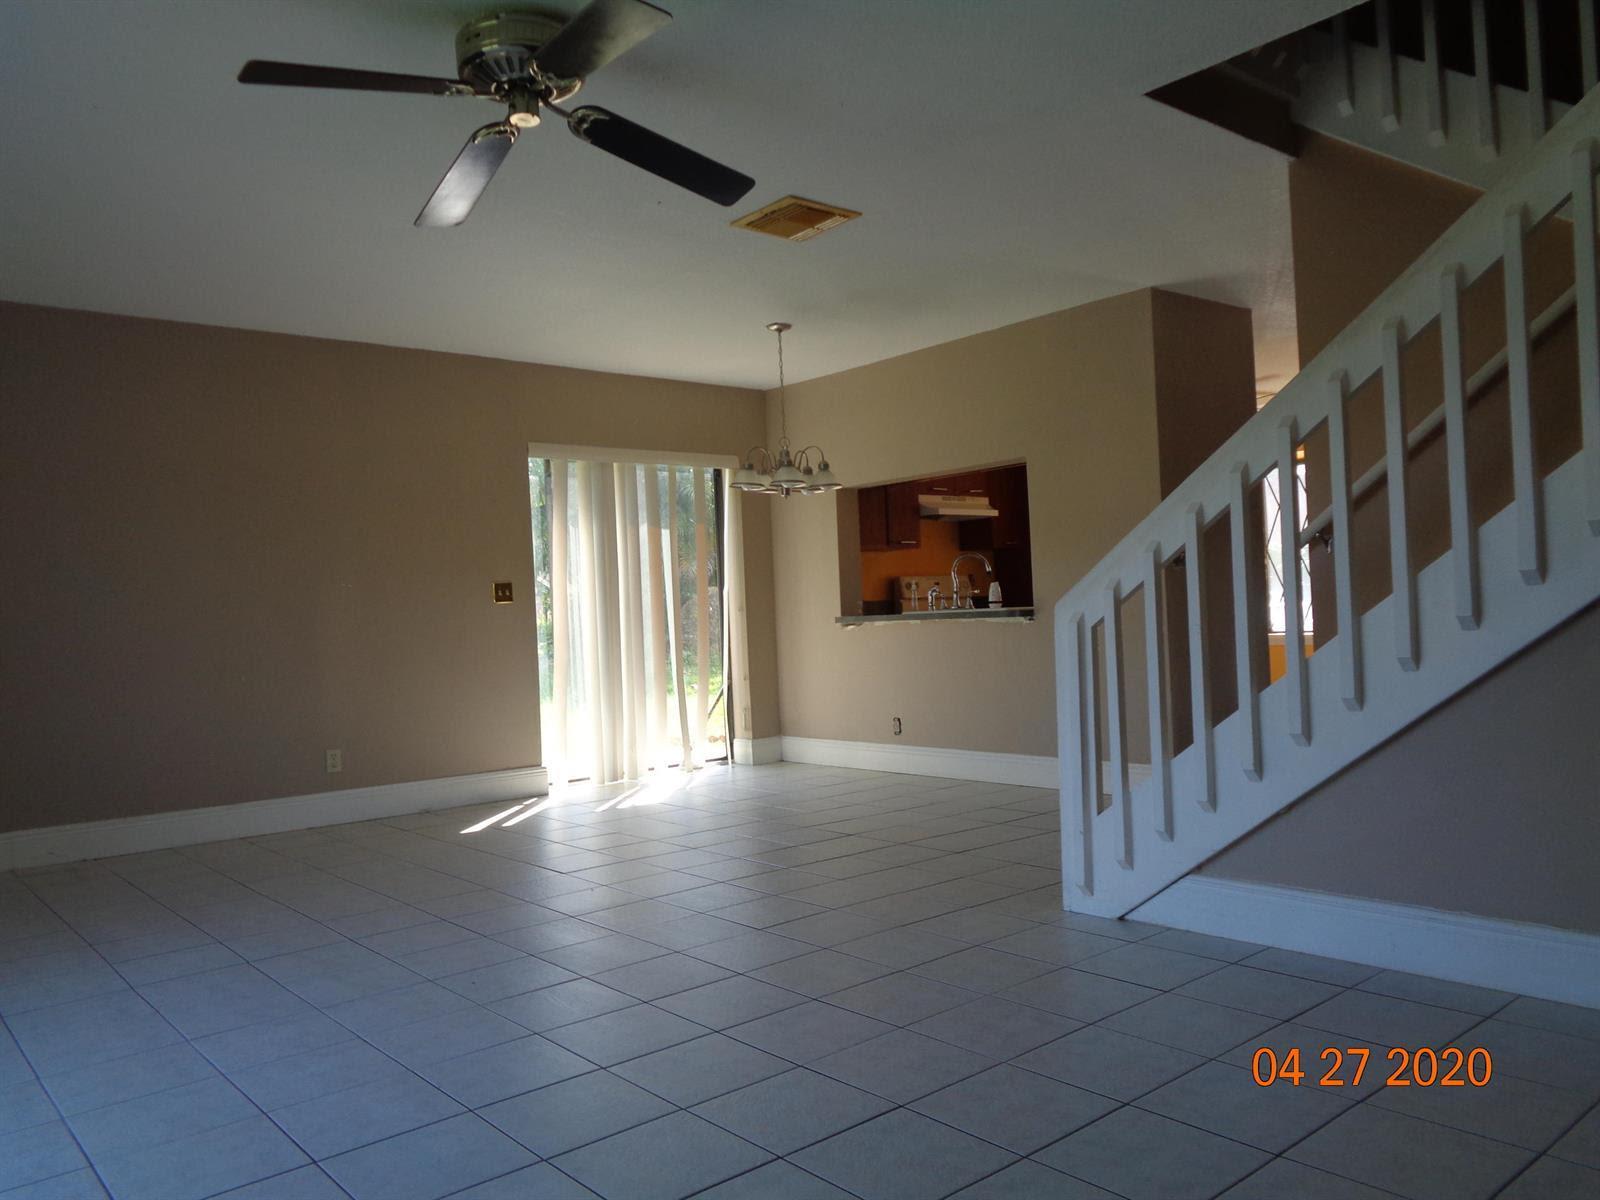 9224 NW 49th Pl Sunrise, FL 33351, USA